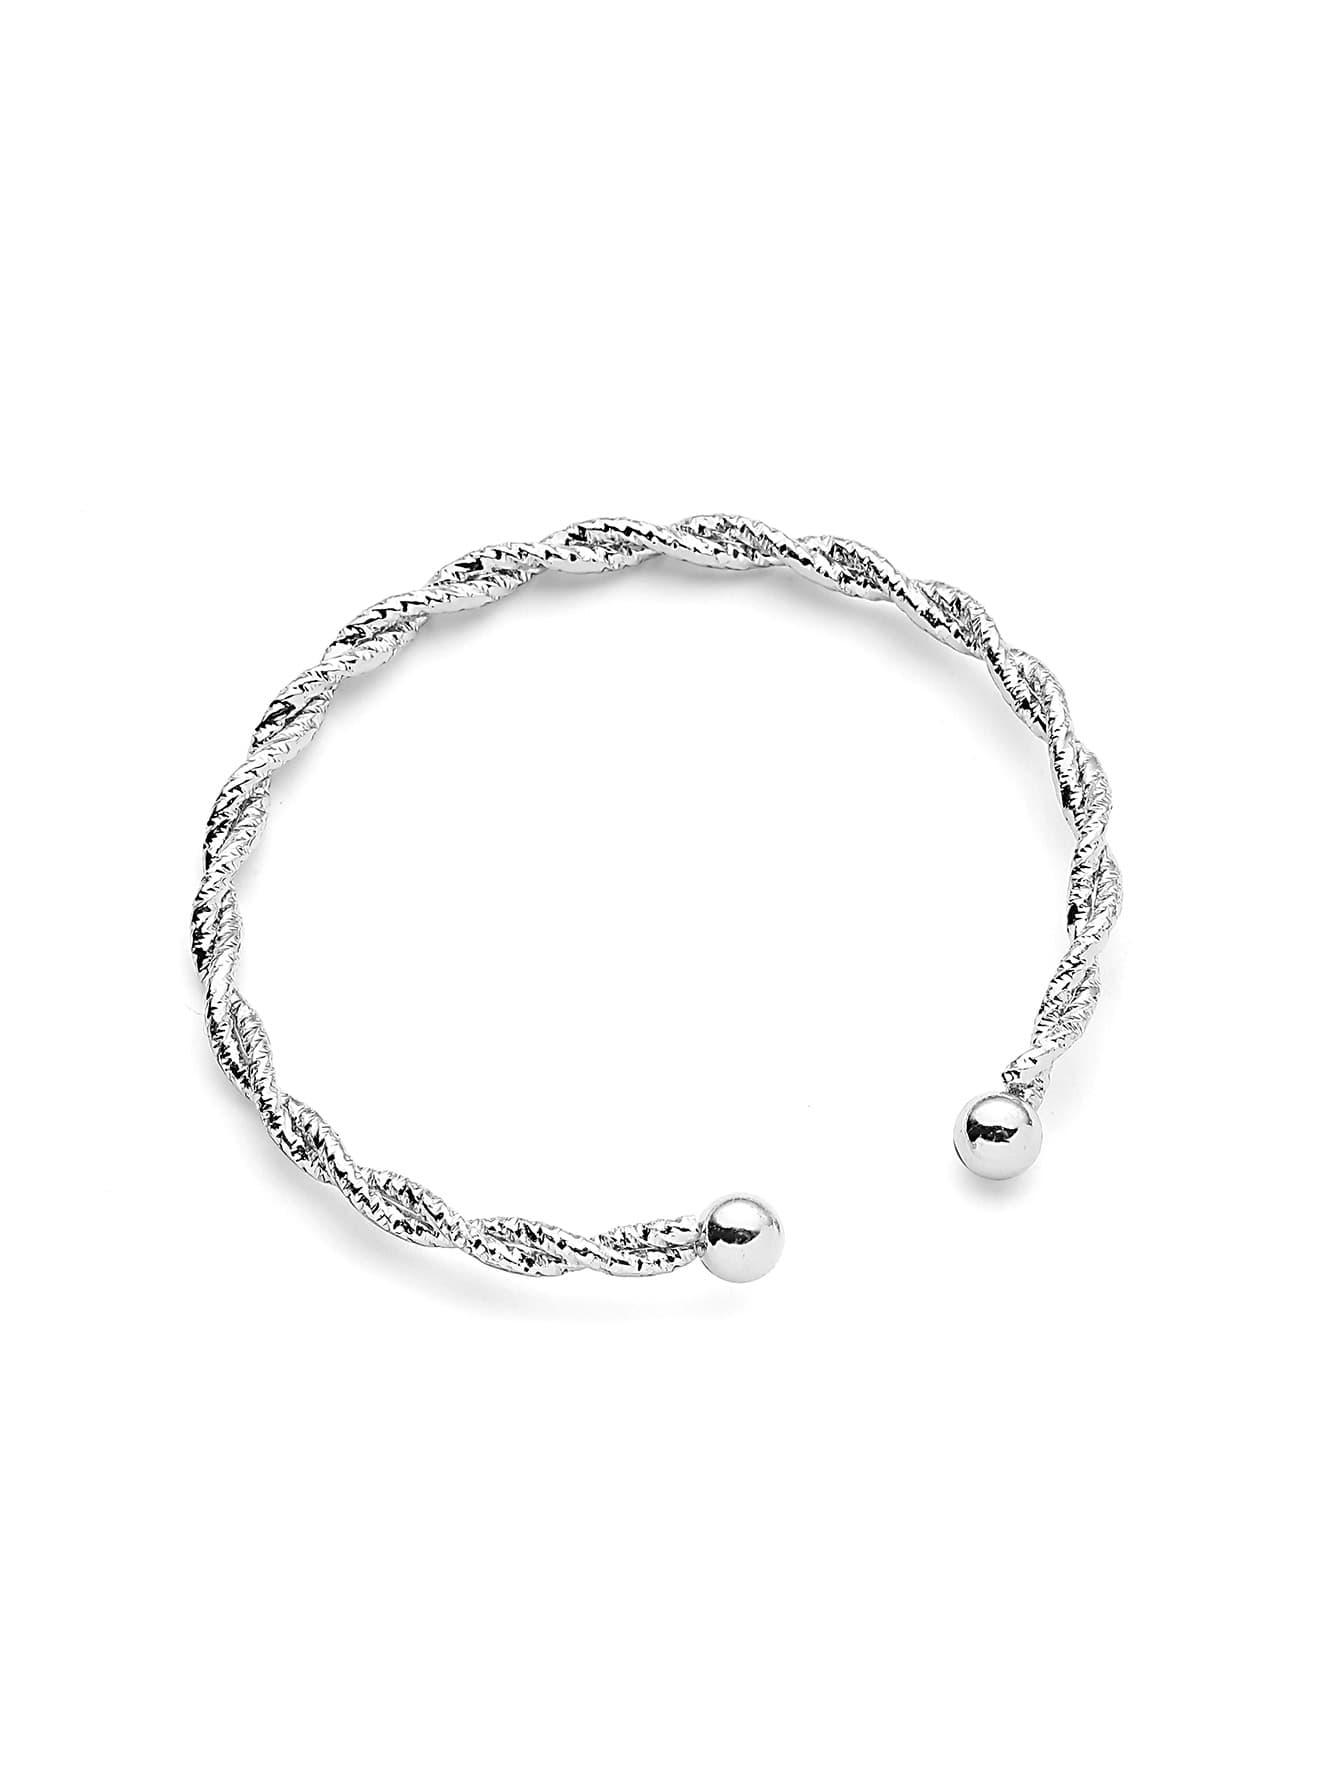 Plated Woven Design Bracelet woven textile design